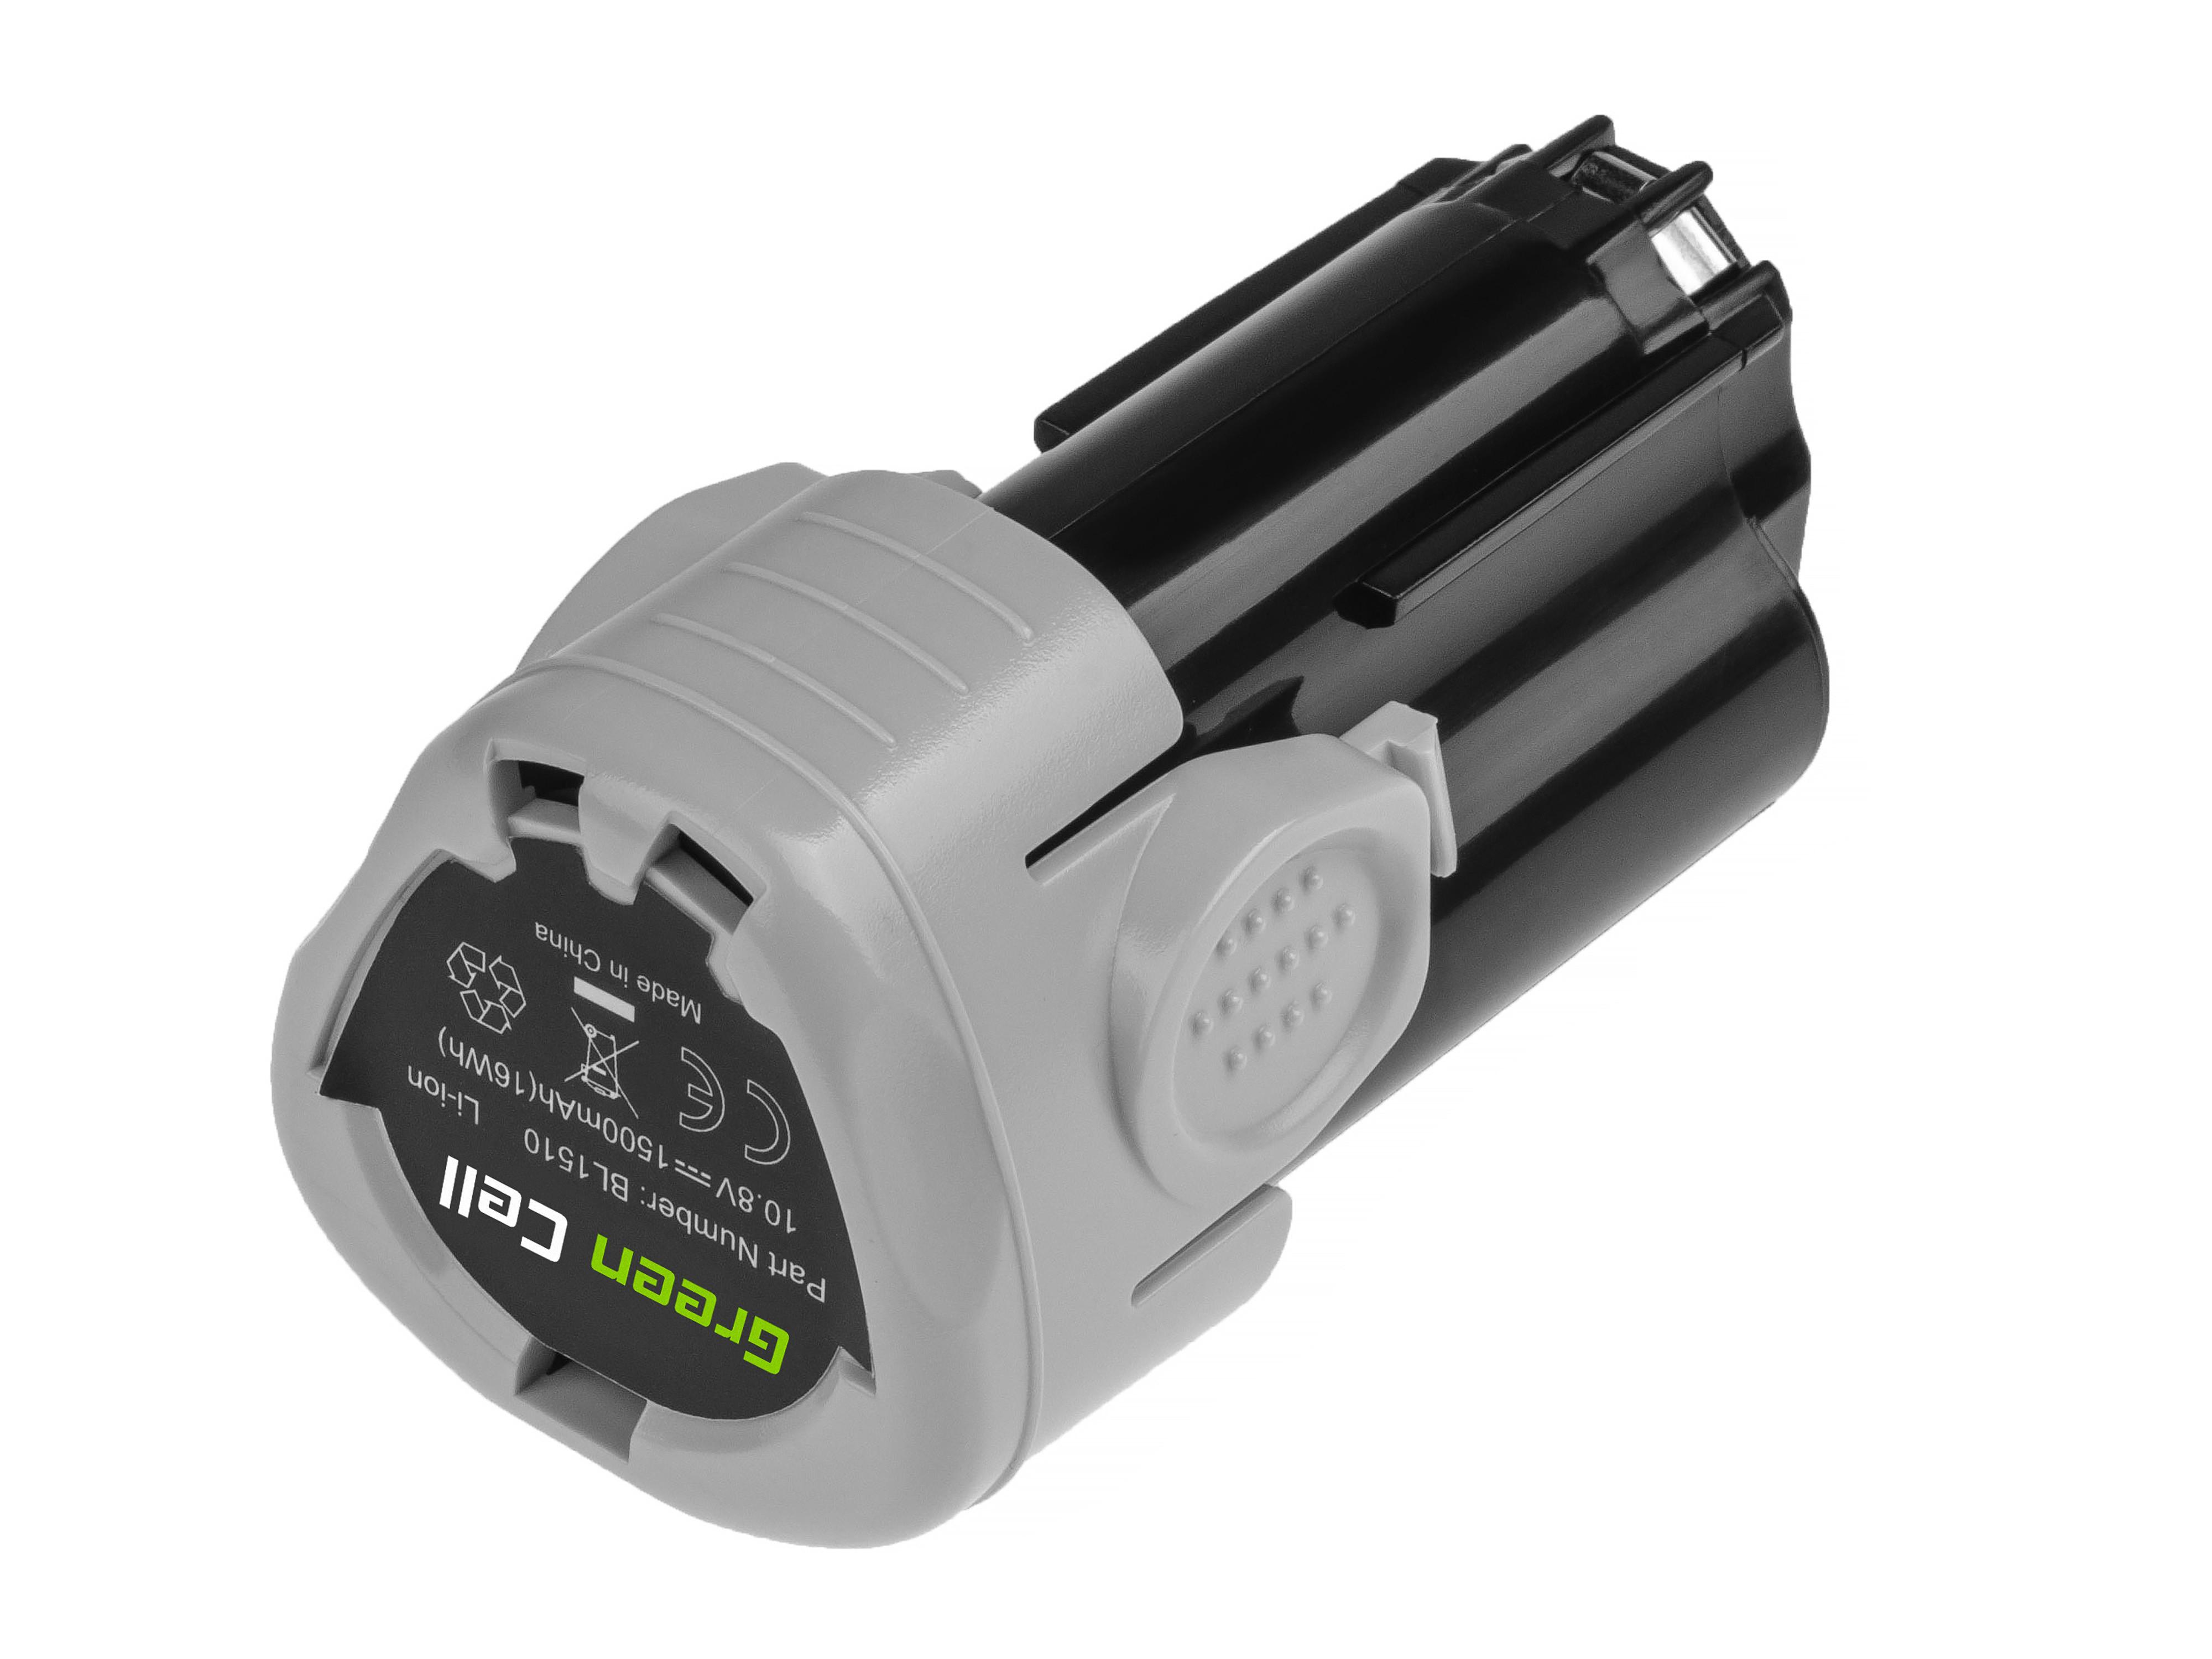 Baterie Green Cell Black&Decker BL1110 BL1310 BL1510 BDCDMT112 10.8V 1500mAh Li-ion - neoriginální